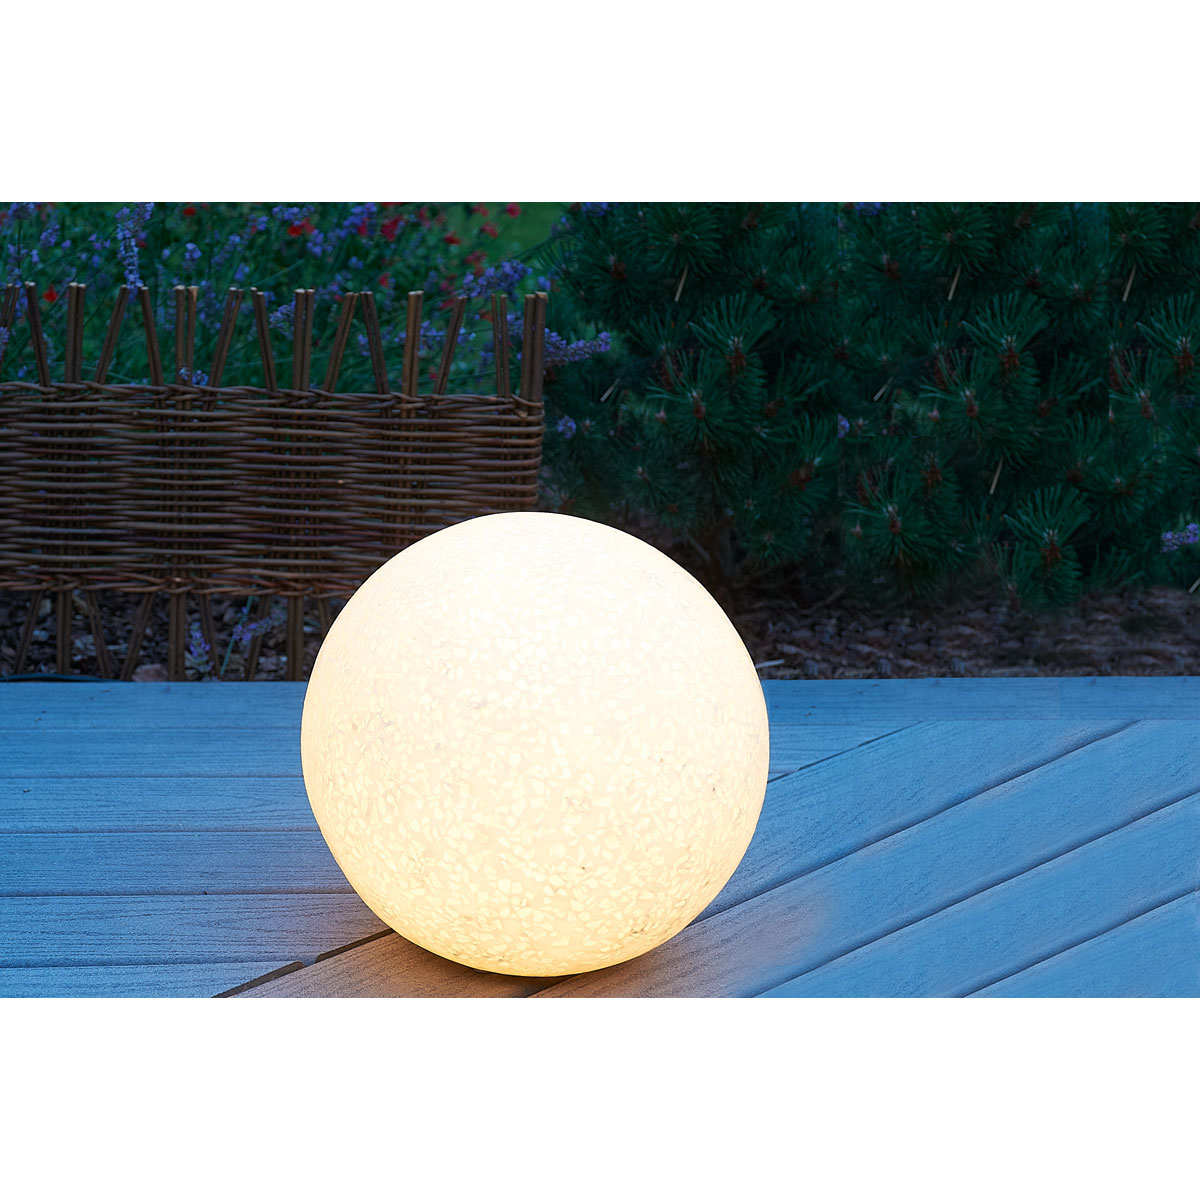 Boule lumineuse jardin : Toutes les astuces pour un joli jardin facilement